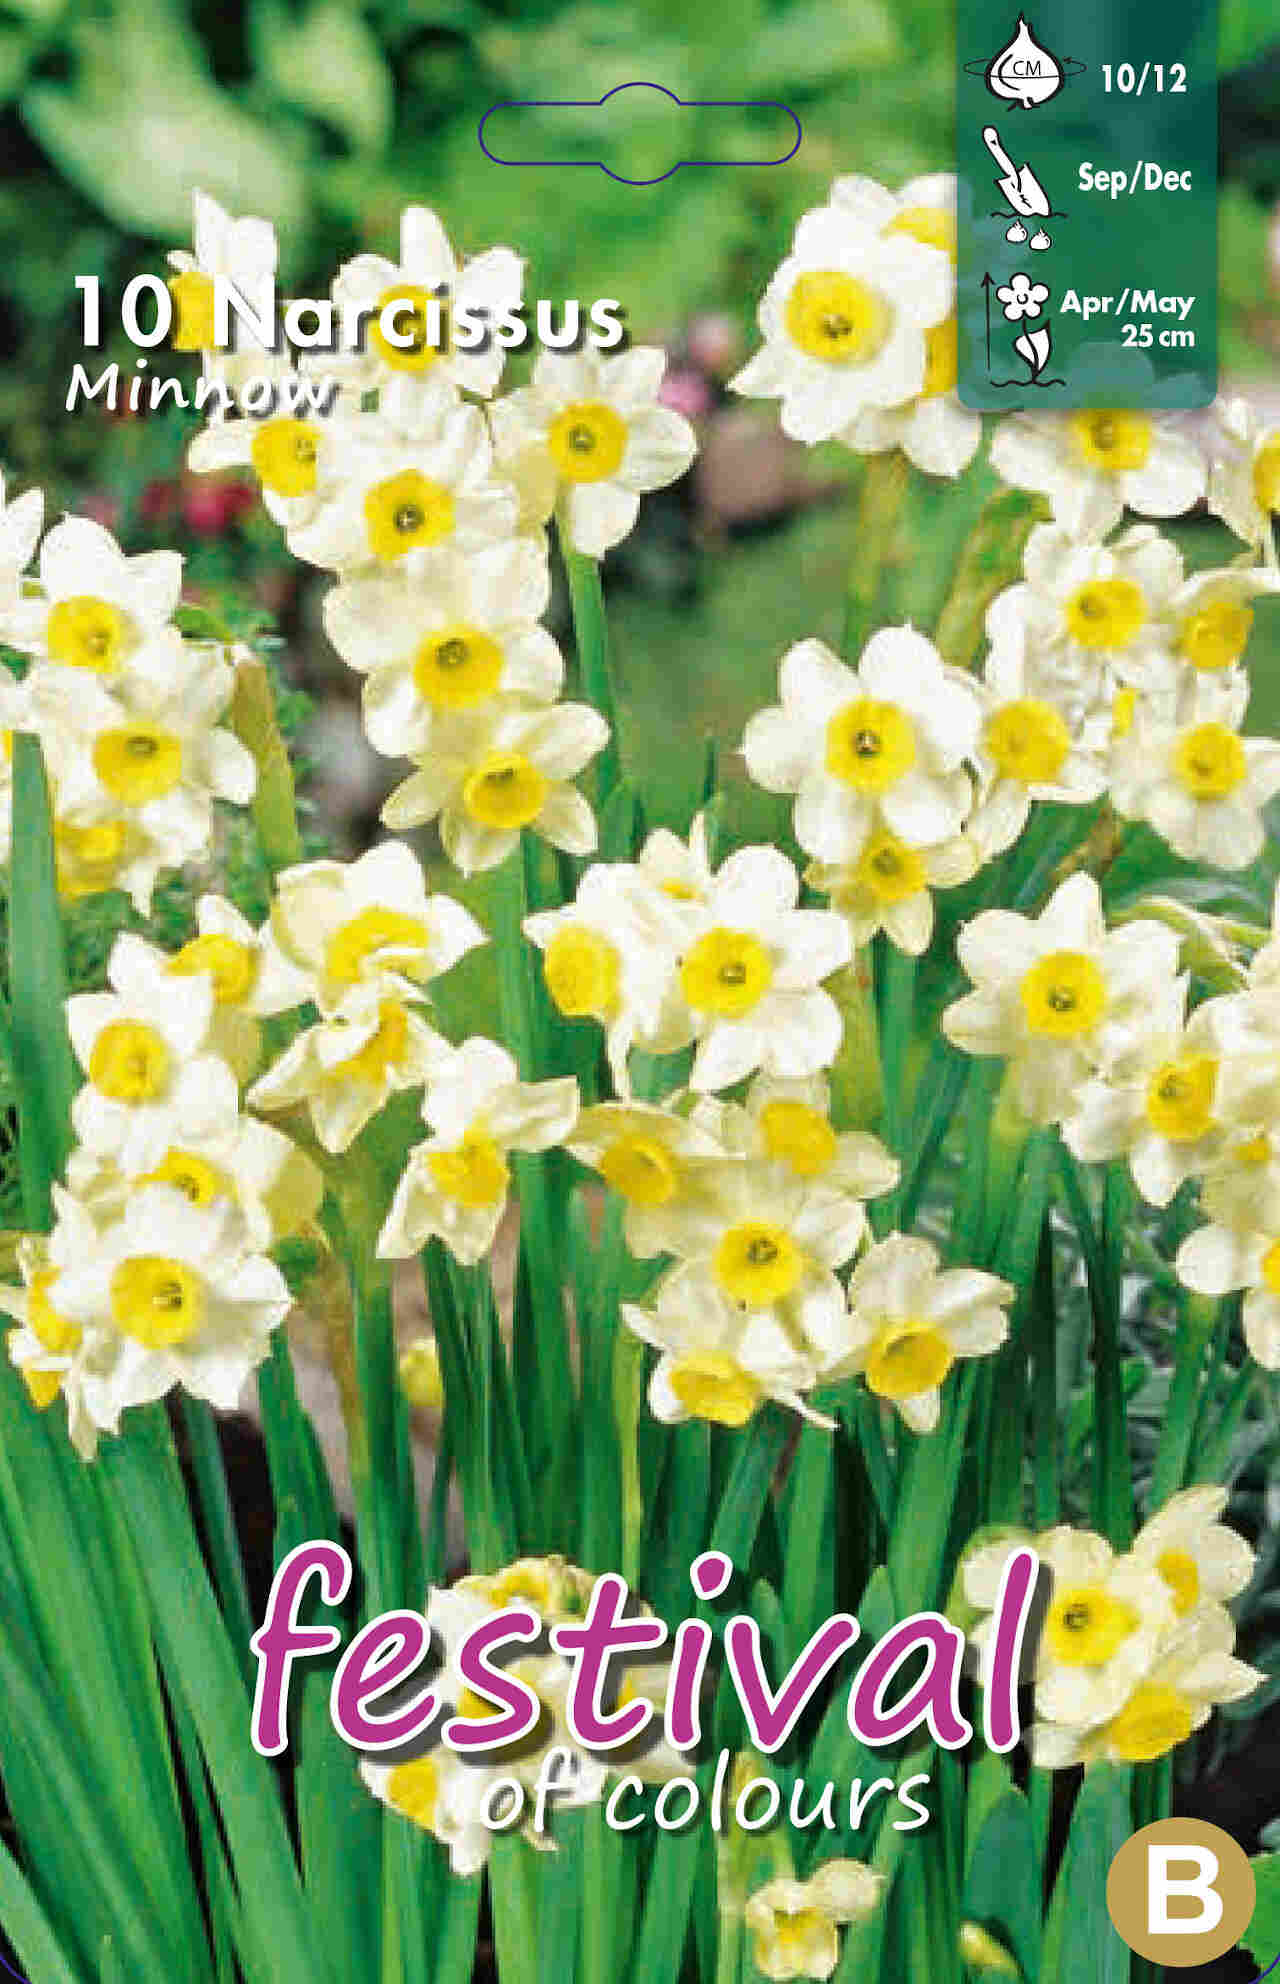 Påskeliljeløg - Narcisses Minnow 10/12